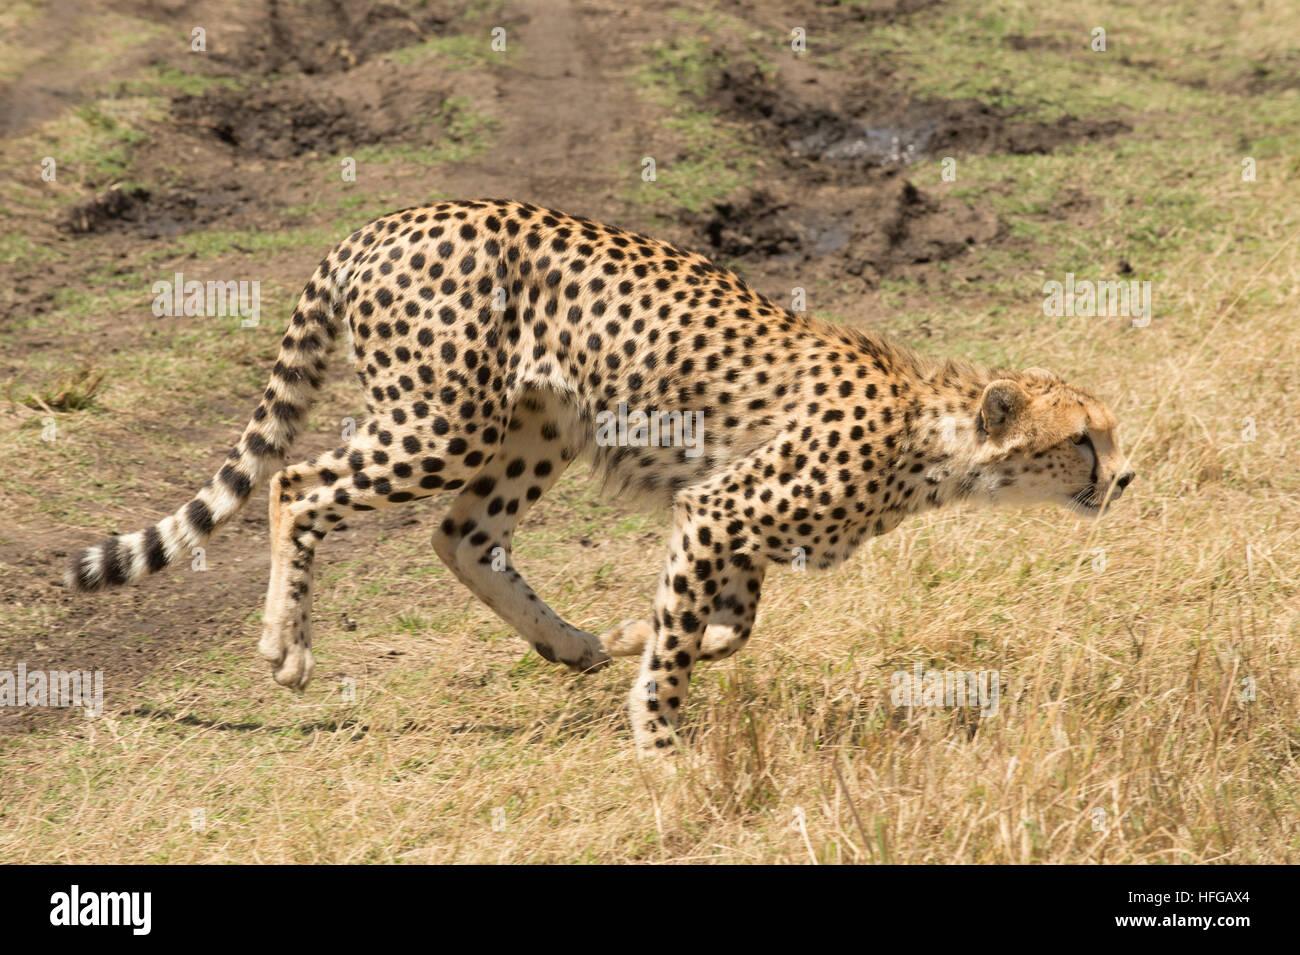 Gepard läuft in Rasen Stockfoto